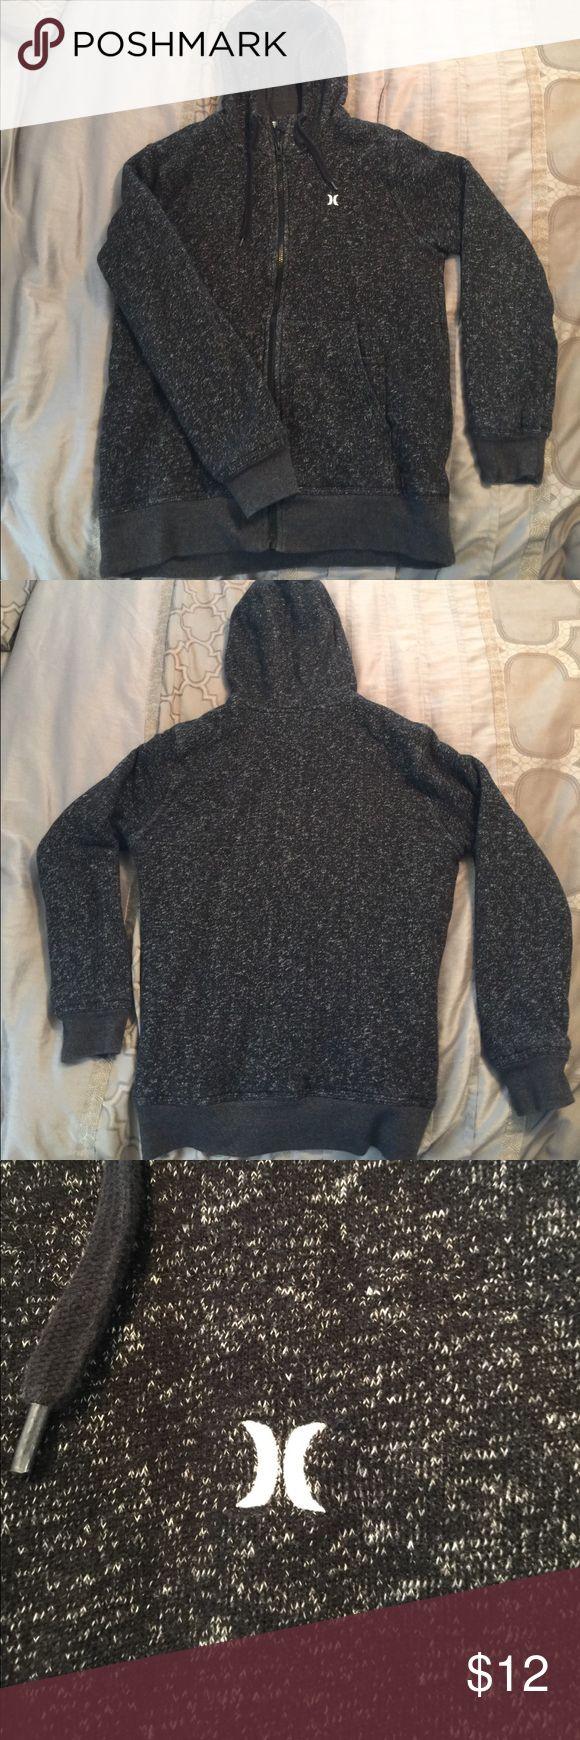 Hurley Zip-Up Hoodie Black & White Super soft zip up Hurley hoodie with front pockets. Black and white blend. Dark grey lining. Gently worn. Jackets & Coats Lightweight & Shirt Jackets